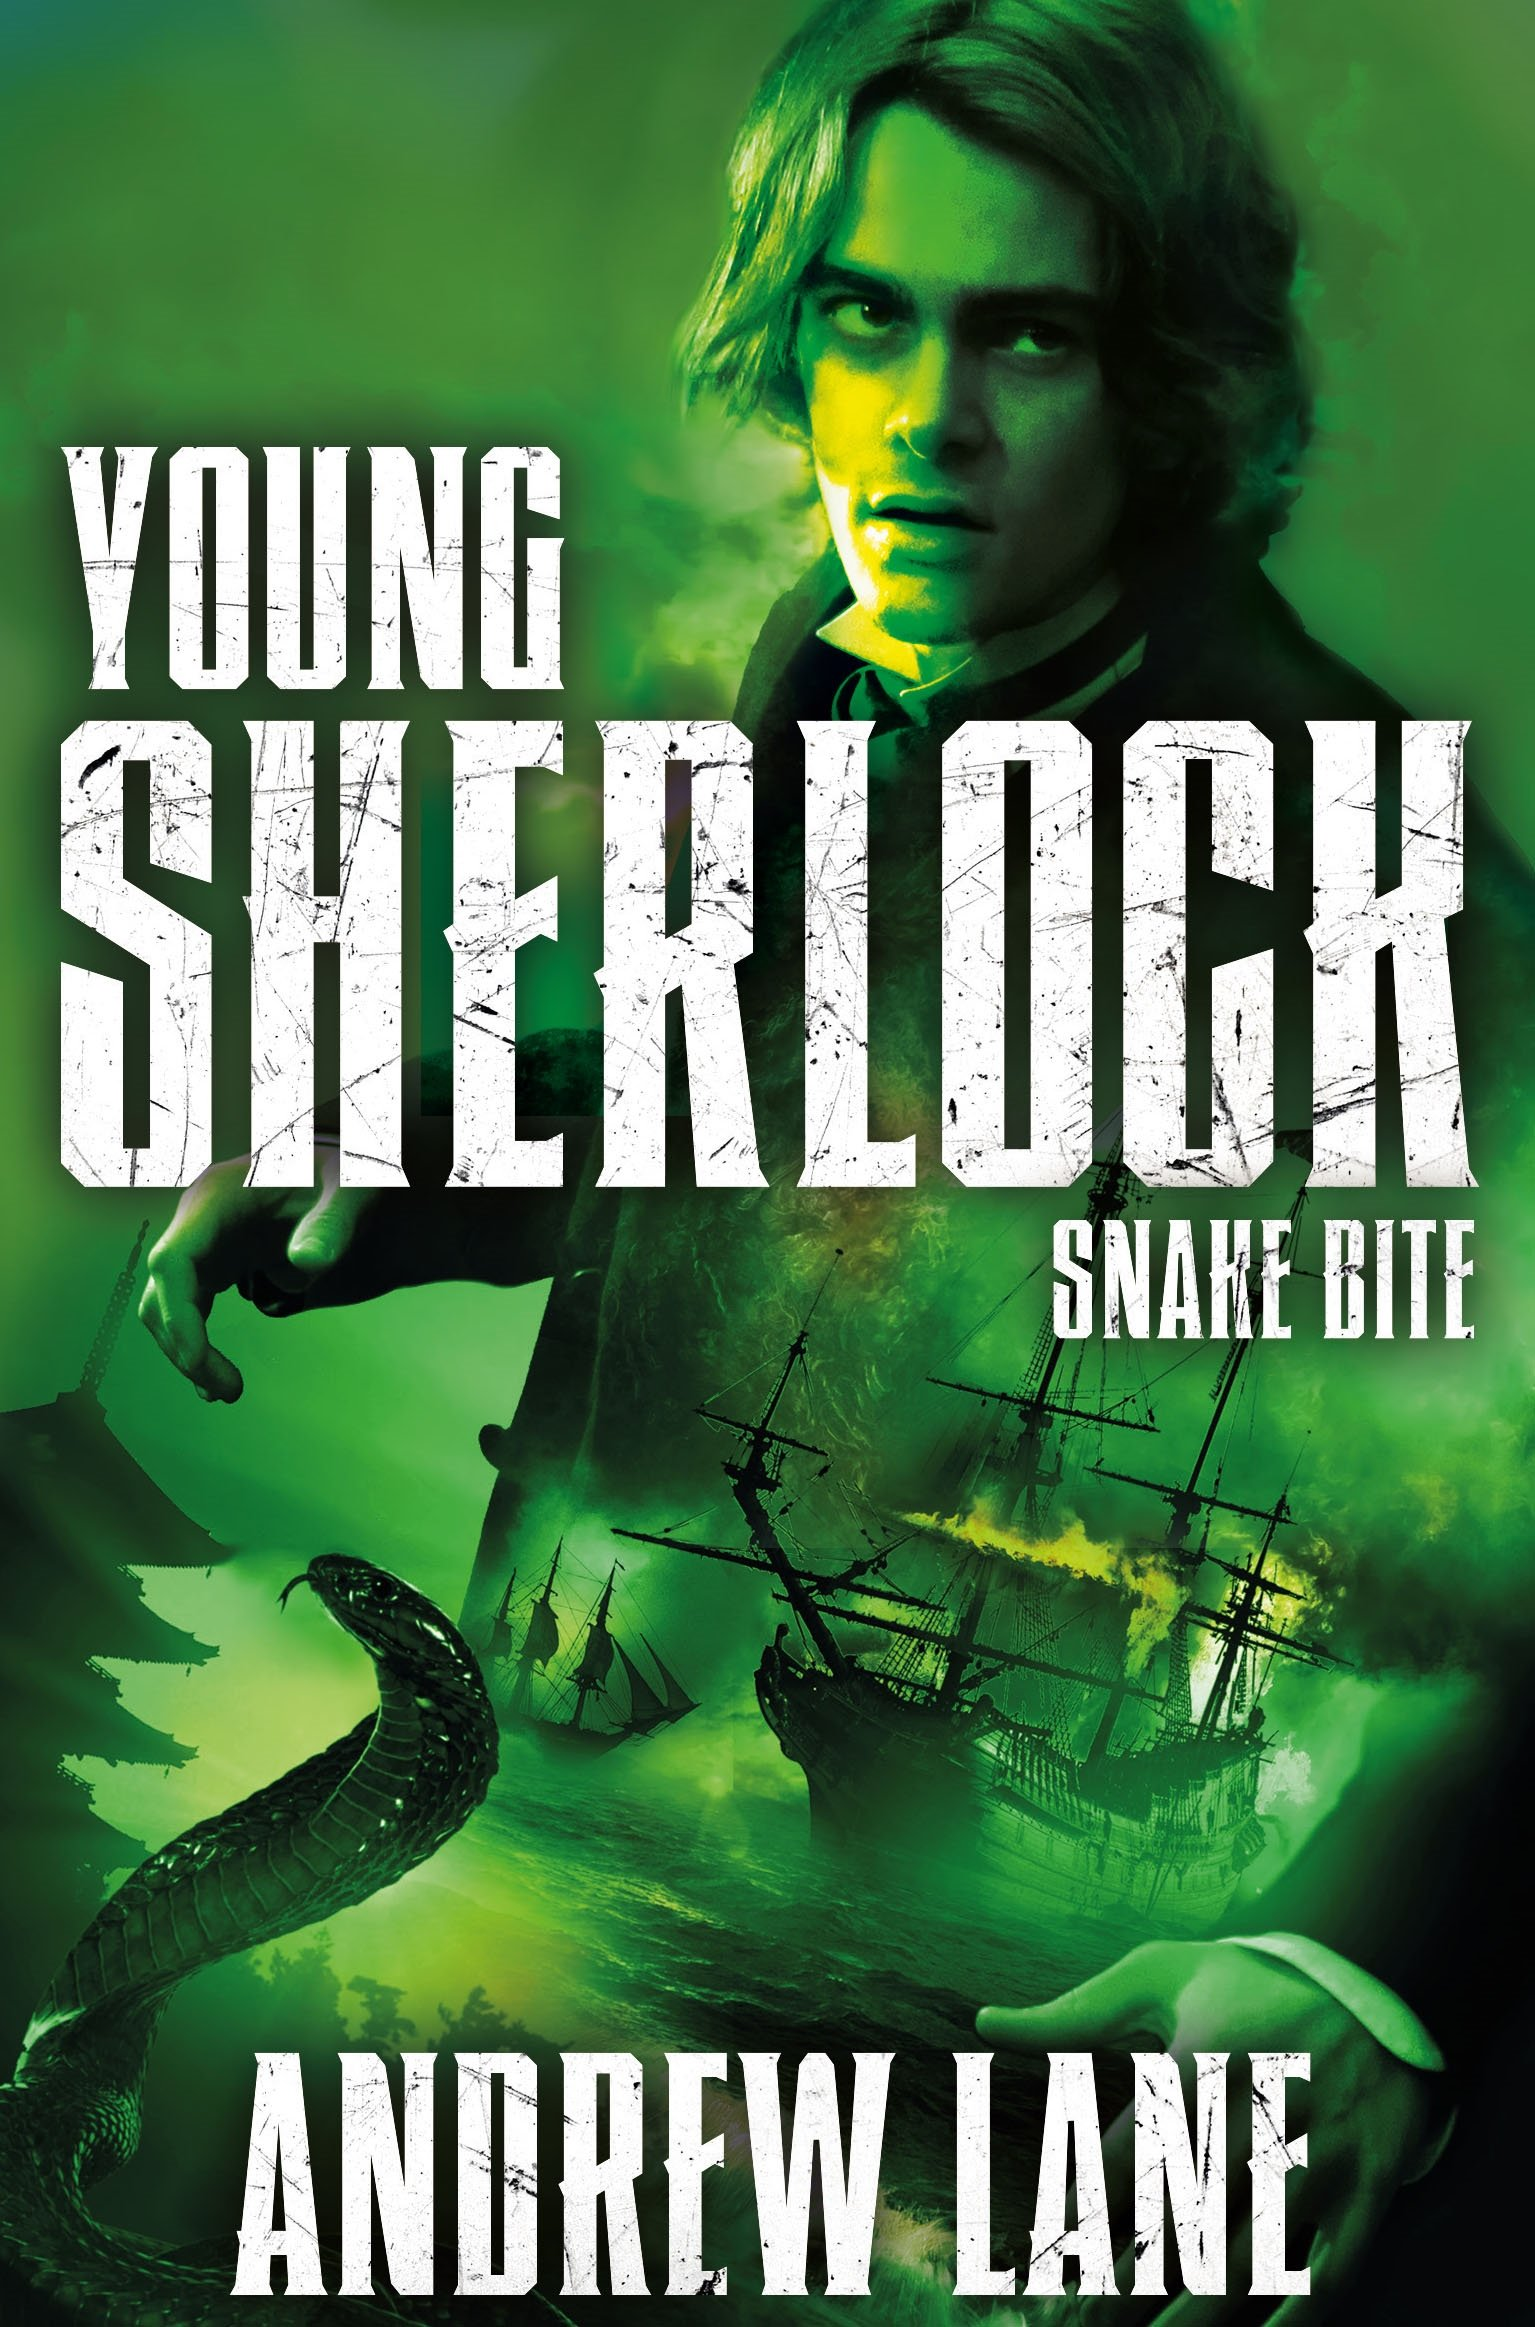 Snake Bite (Young Sherlock Holmes, Band 5)